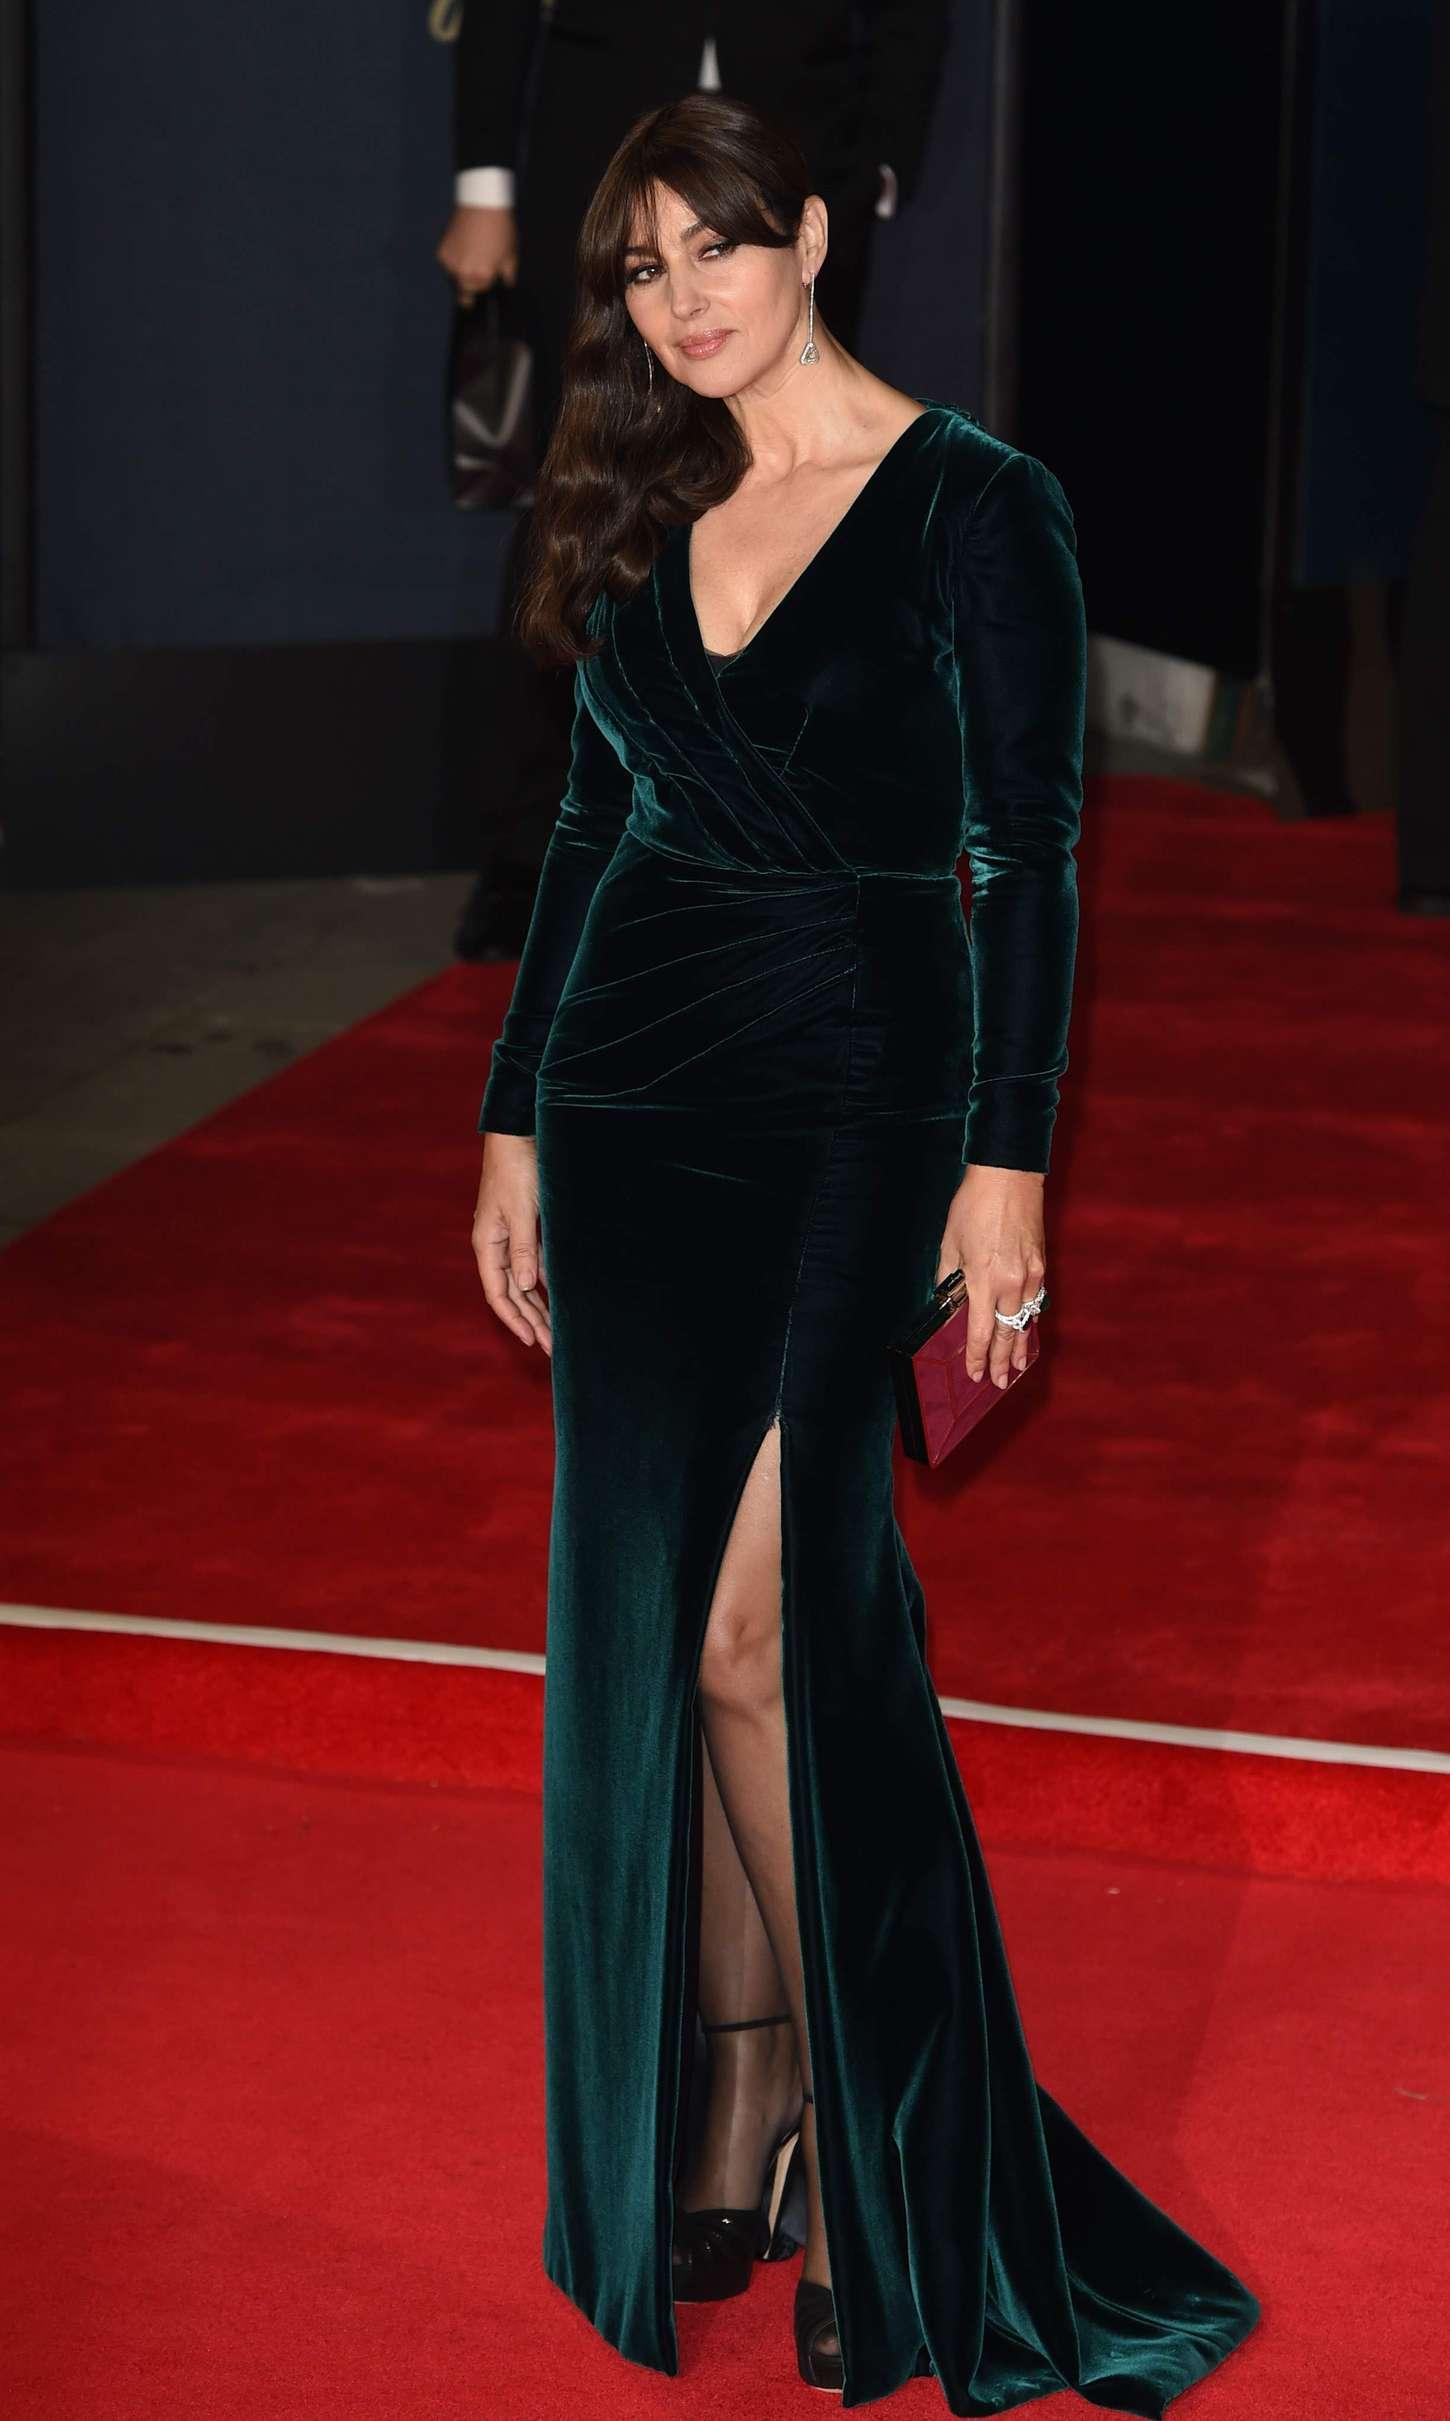 Monica Bellucci Spectre Premiere In London Gotceleb